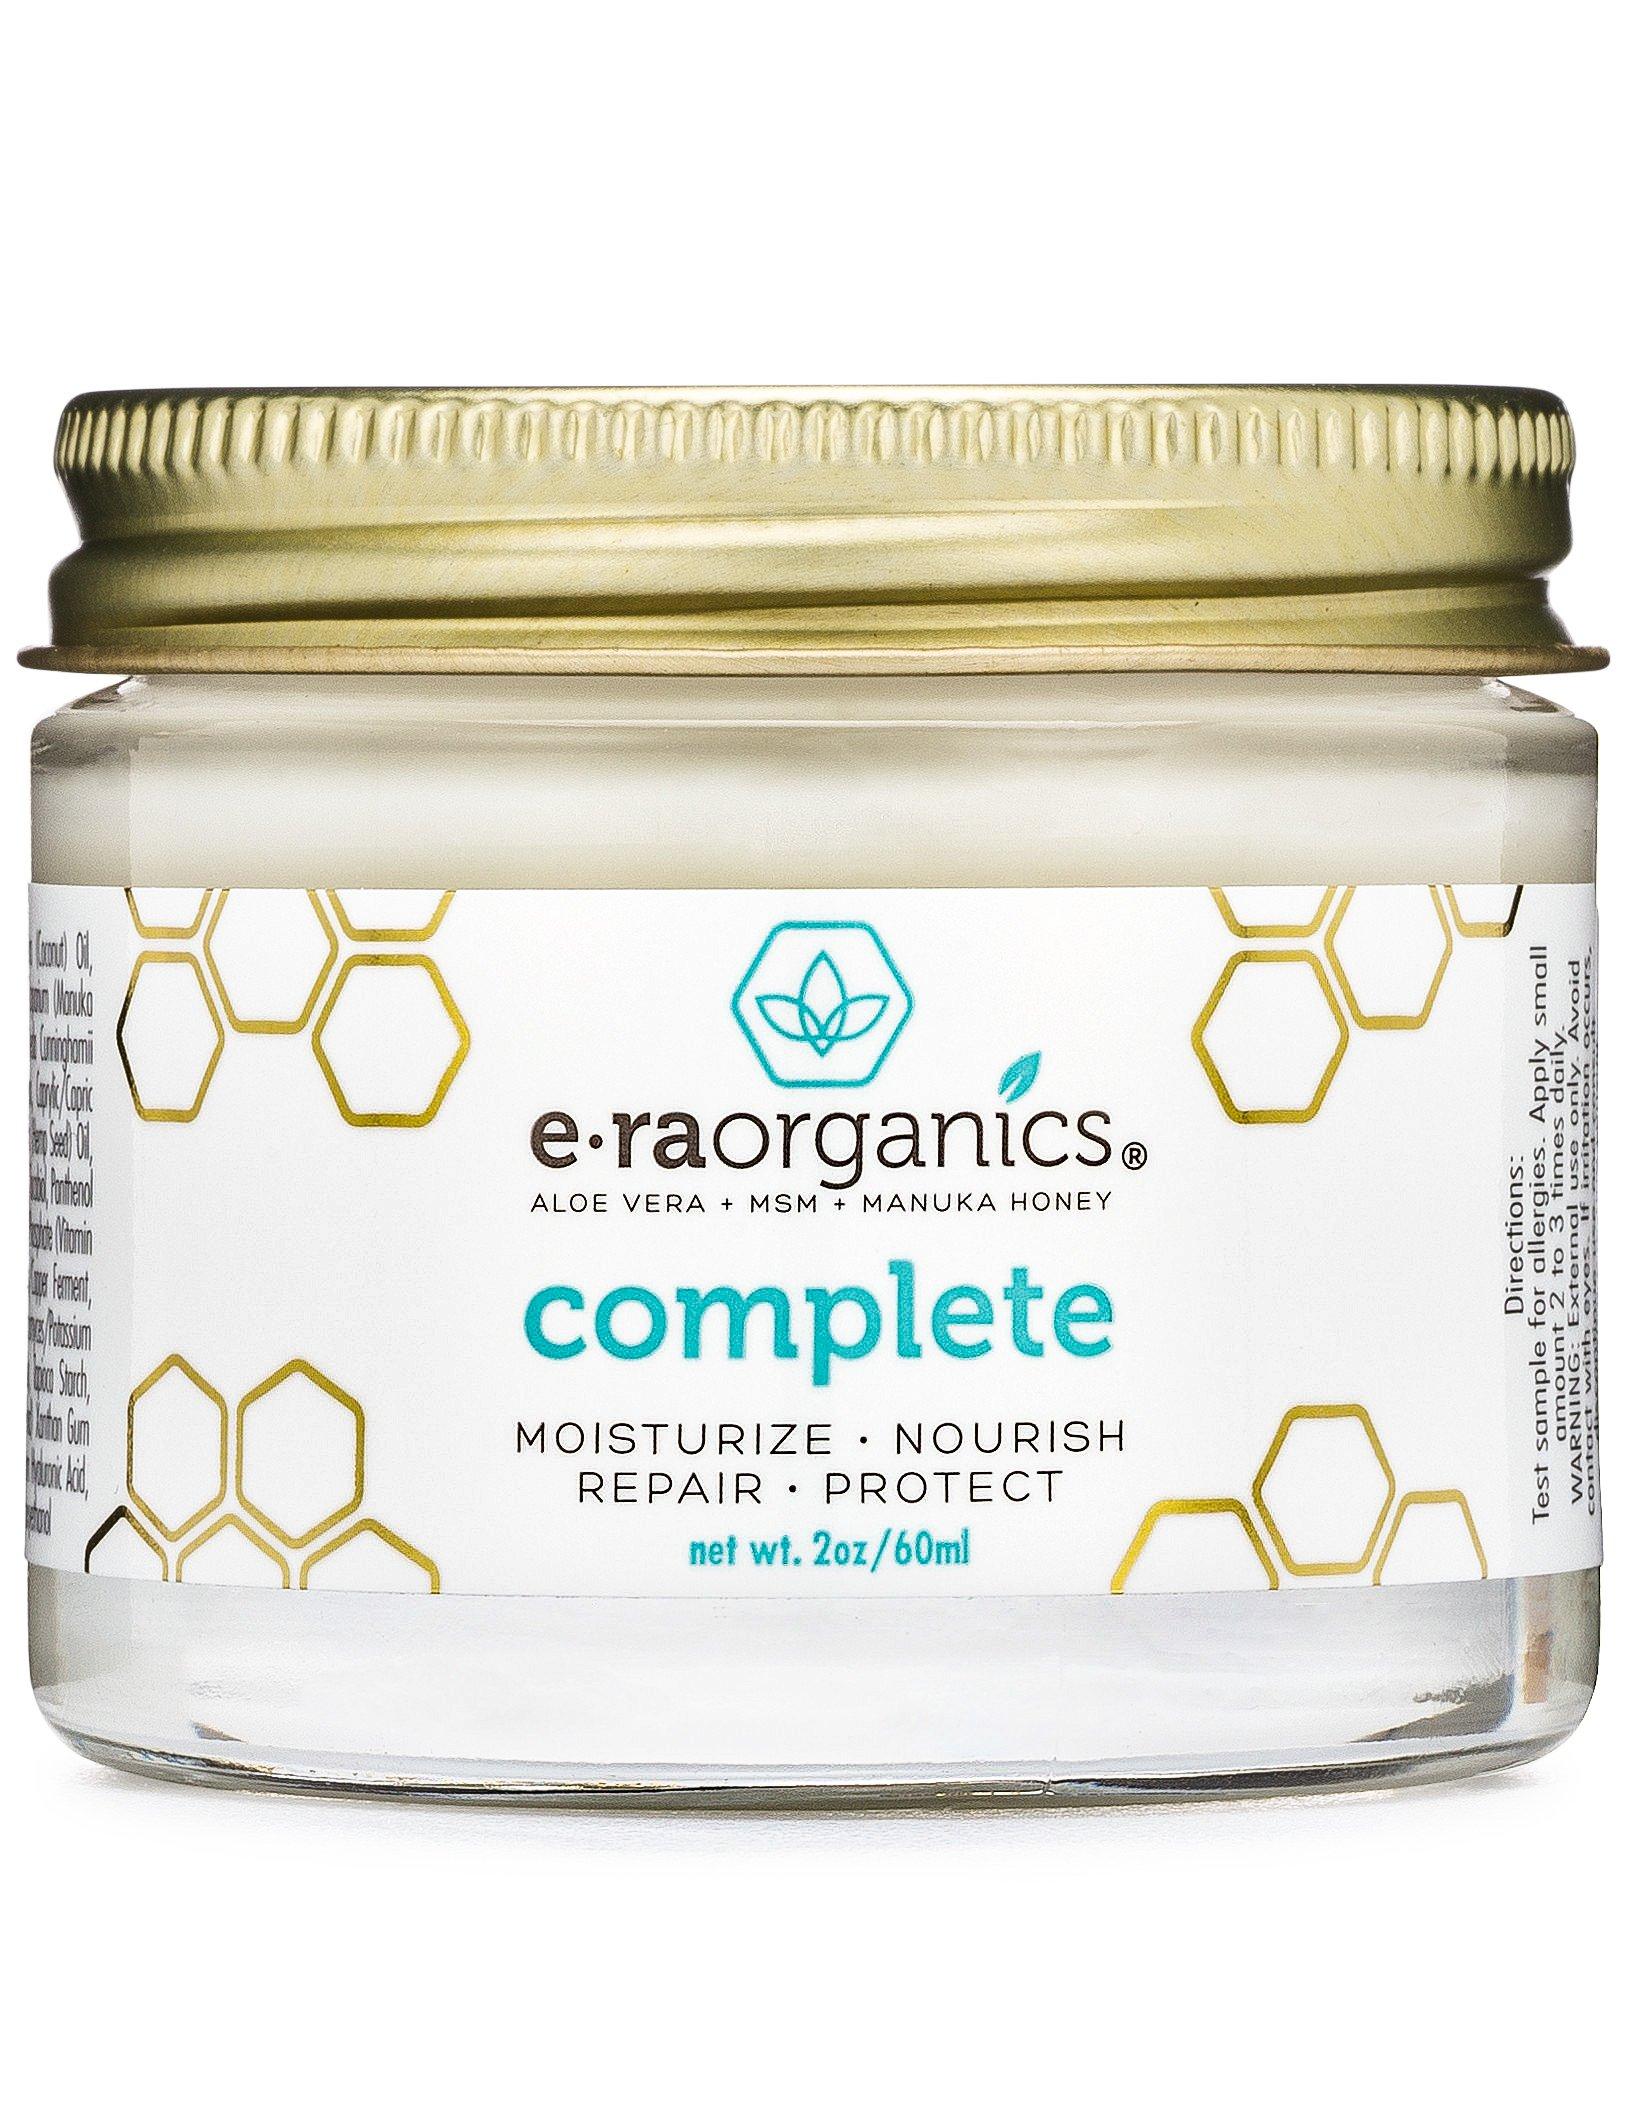 Natural & Organic Face Moisturizer Cream - Extra Nourishing & Hydrating 10-In-1 Daily Facial Cream with Aloe Vera, Manuka Honey, Coconut Oil, Cocoa Butter For Oily, Dry, Sensitive Skin Era-Organics by Era Organics